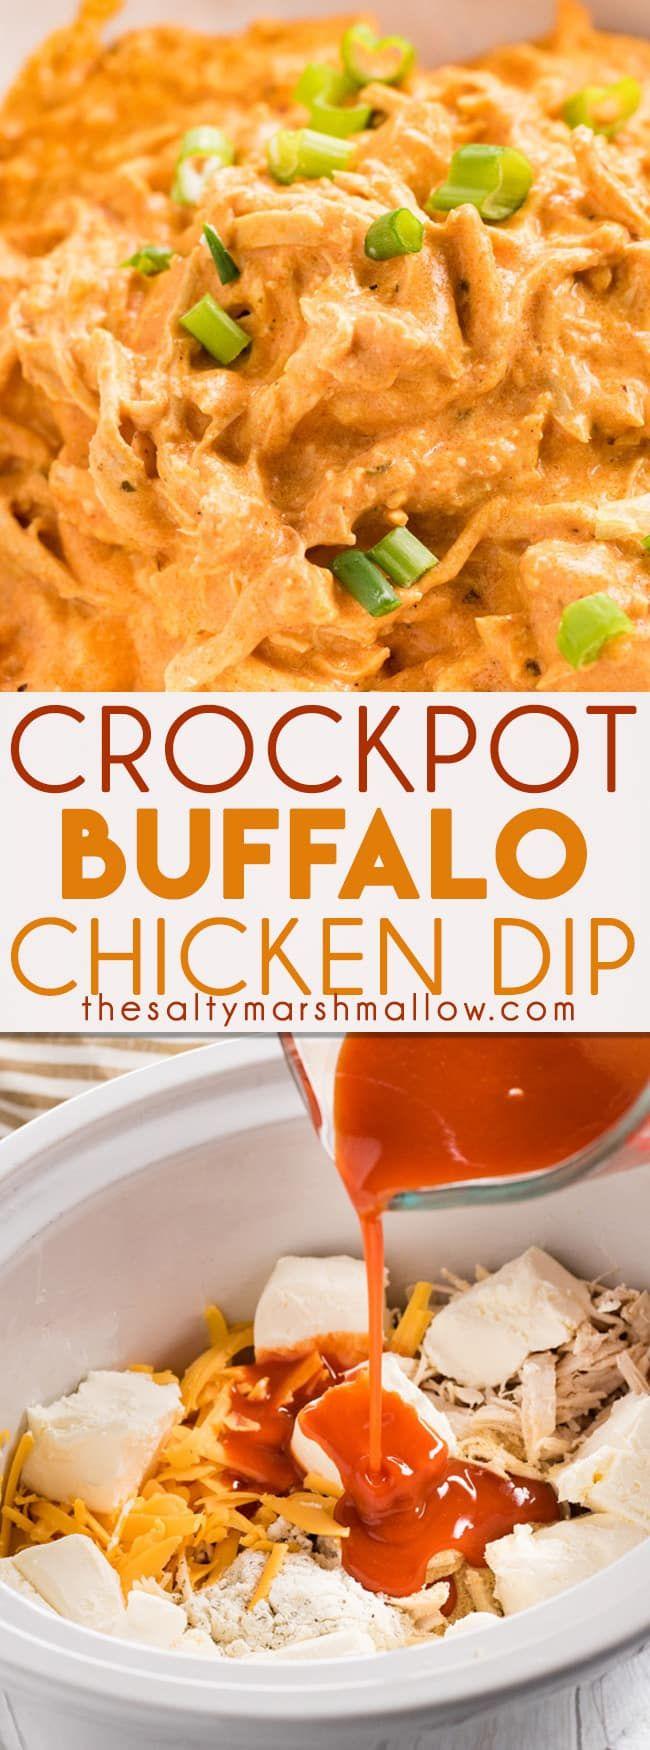 Buffalo Chicken Dip The Salty Marshmallow Recipe Food Chicken Dip Recipe Recipes